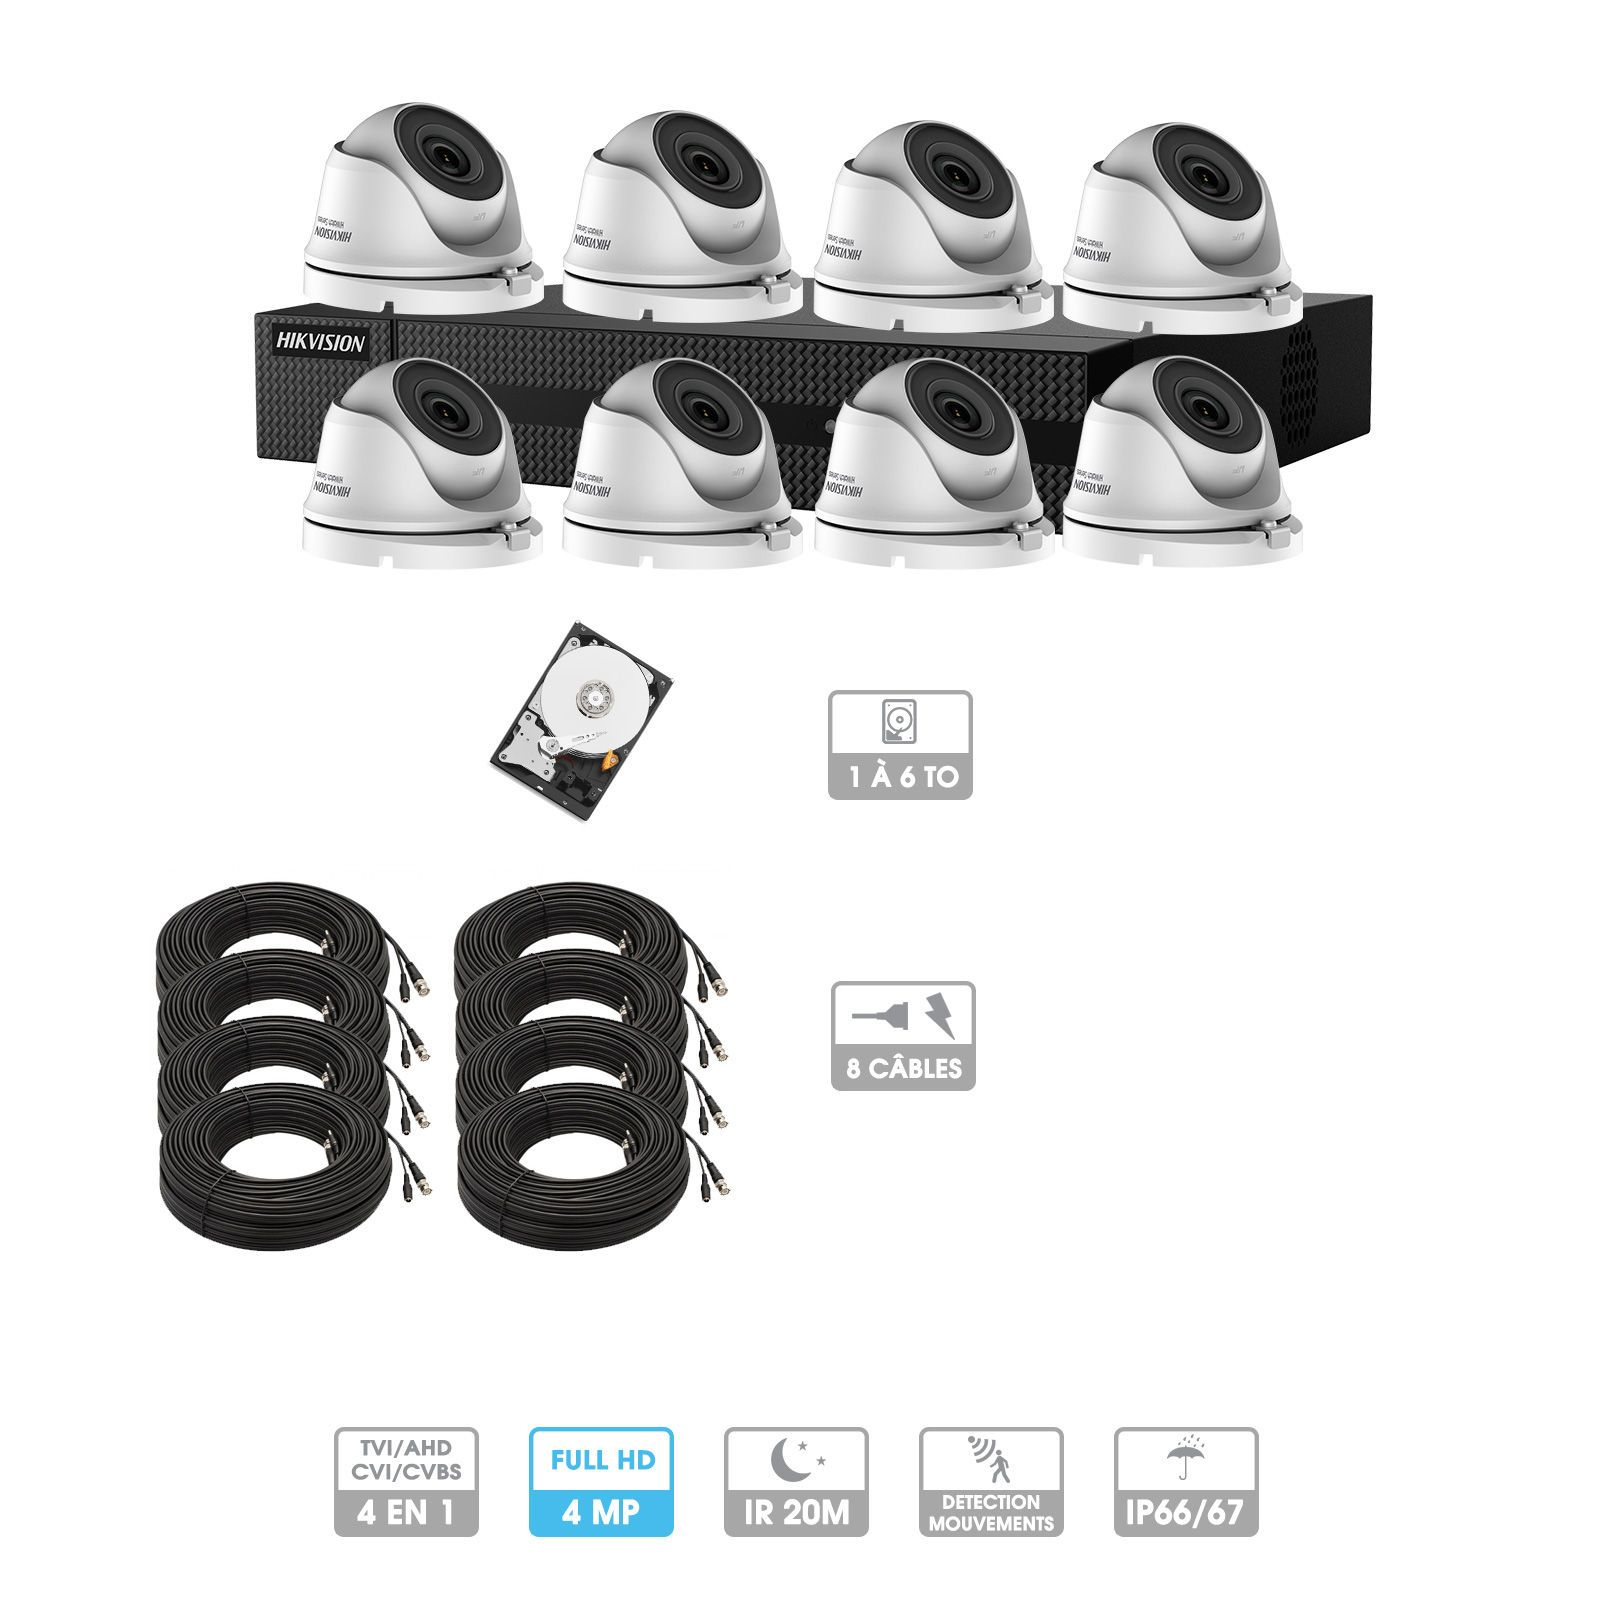 Kit vidéosurveillance 8 caméras | 4MP HD | 8 câbles 20 mètres | HDD 1To | Dômes Hiwatch